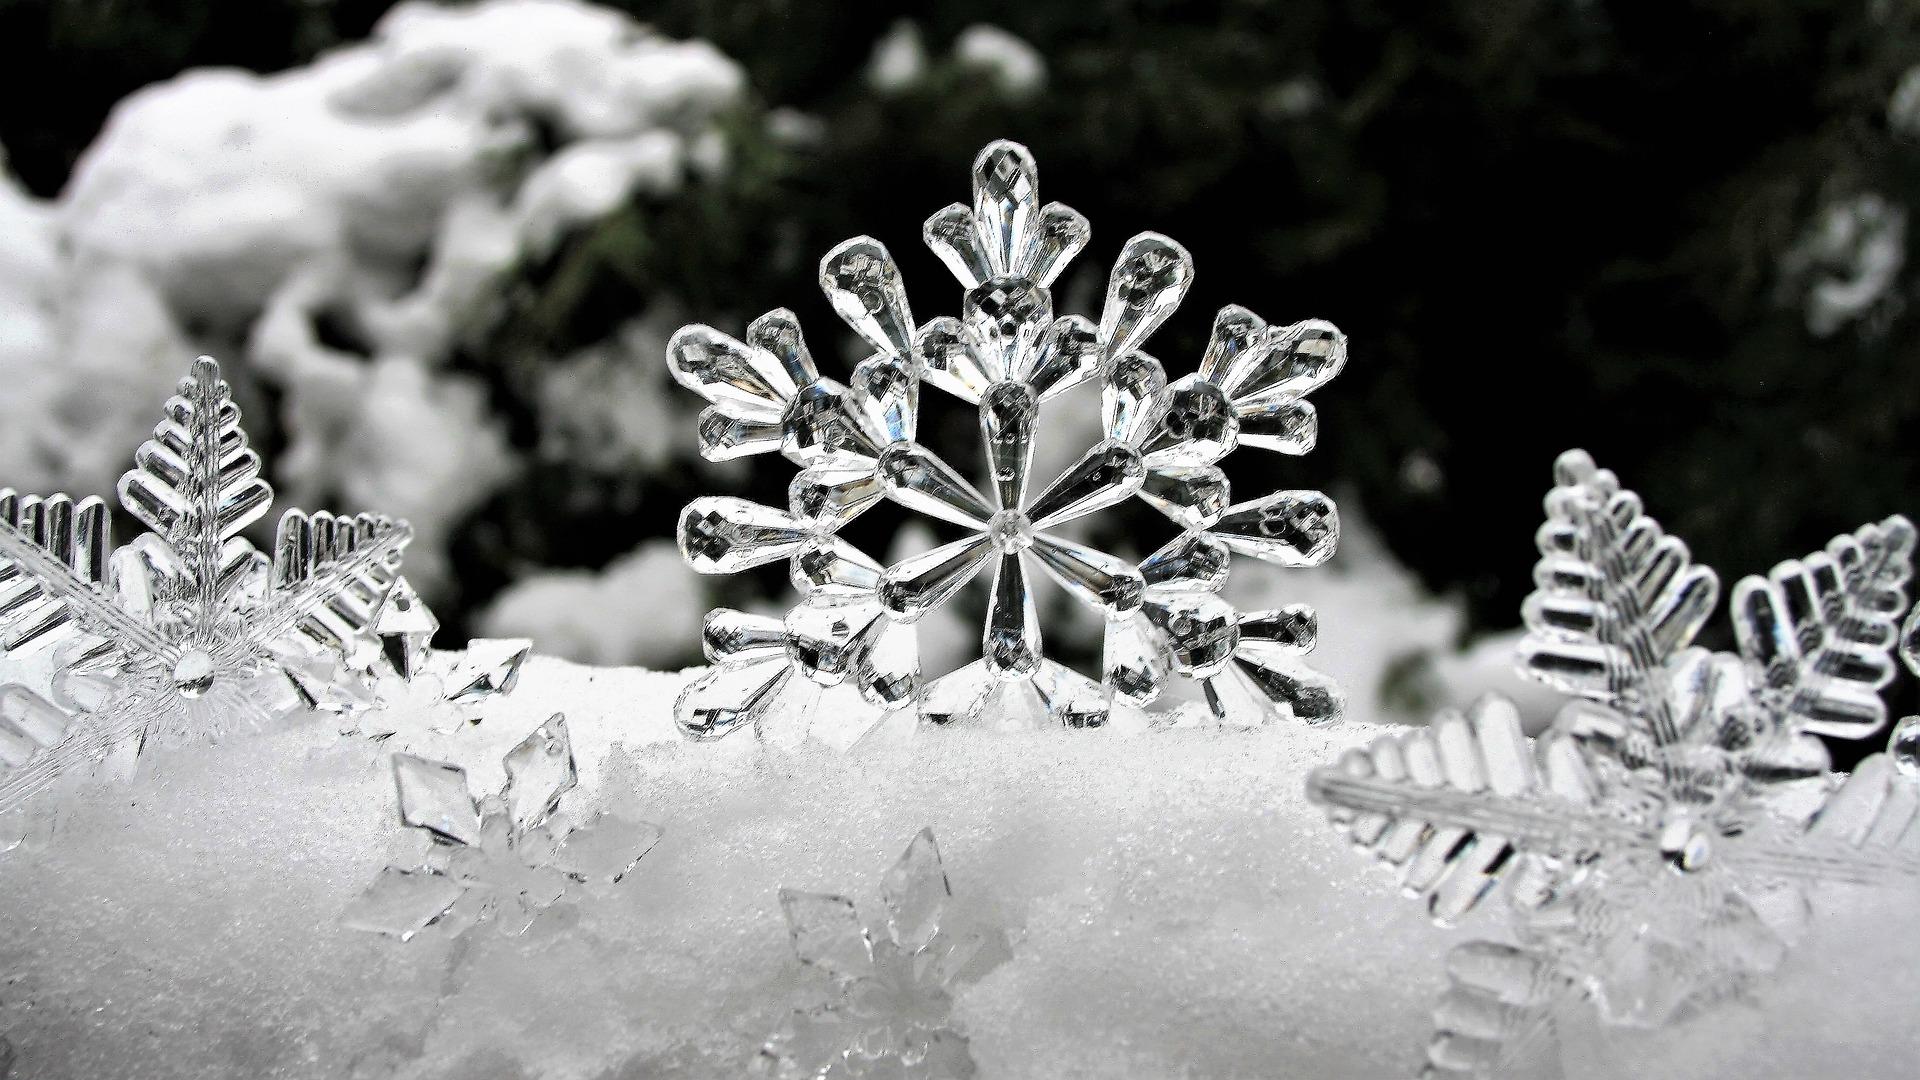 ice-3009009_1920.jpg